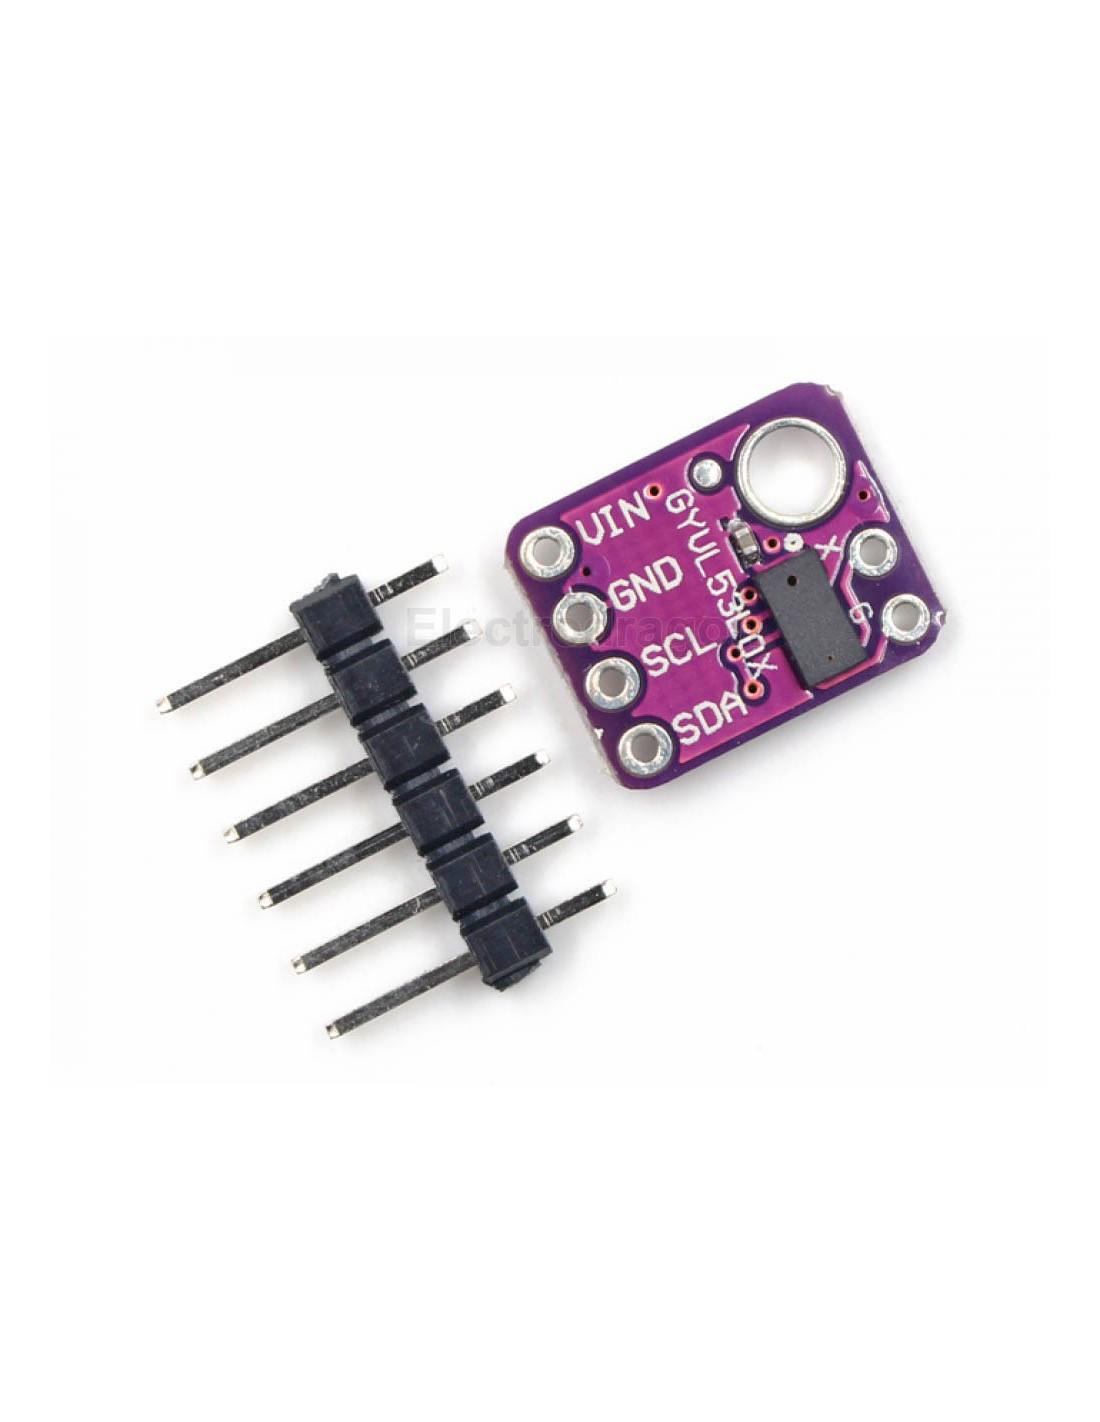 VL53L0X V2 laser ranging sensor I2C IIC